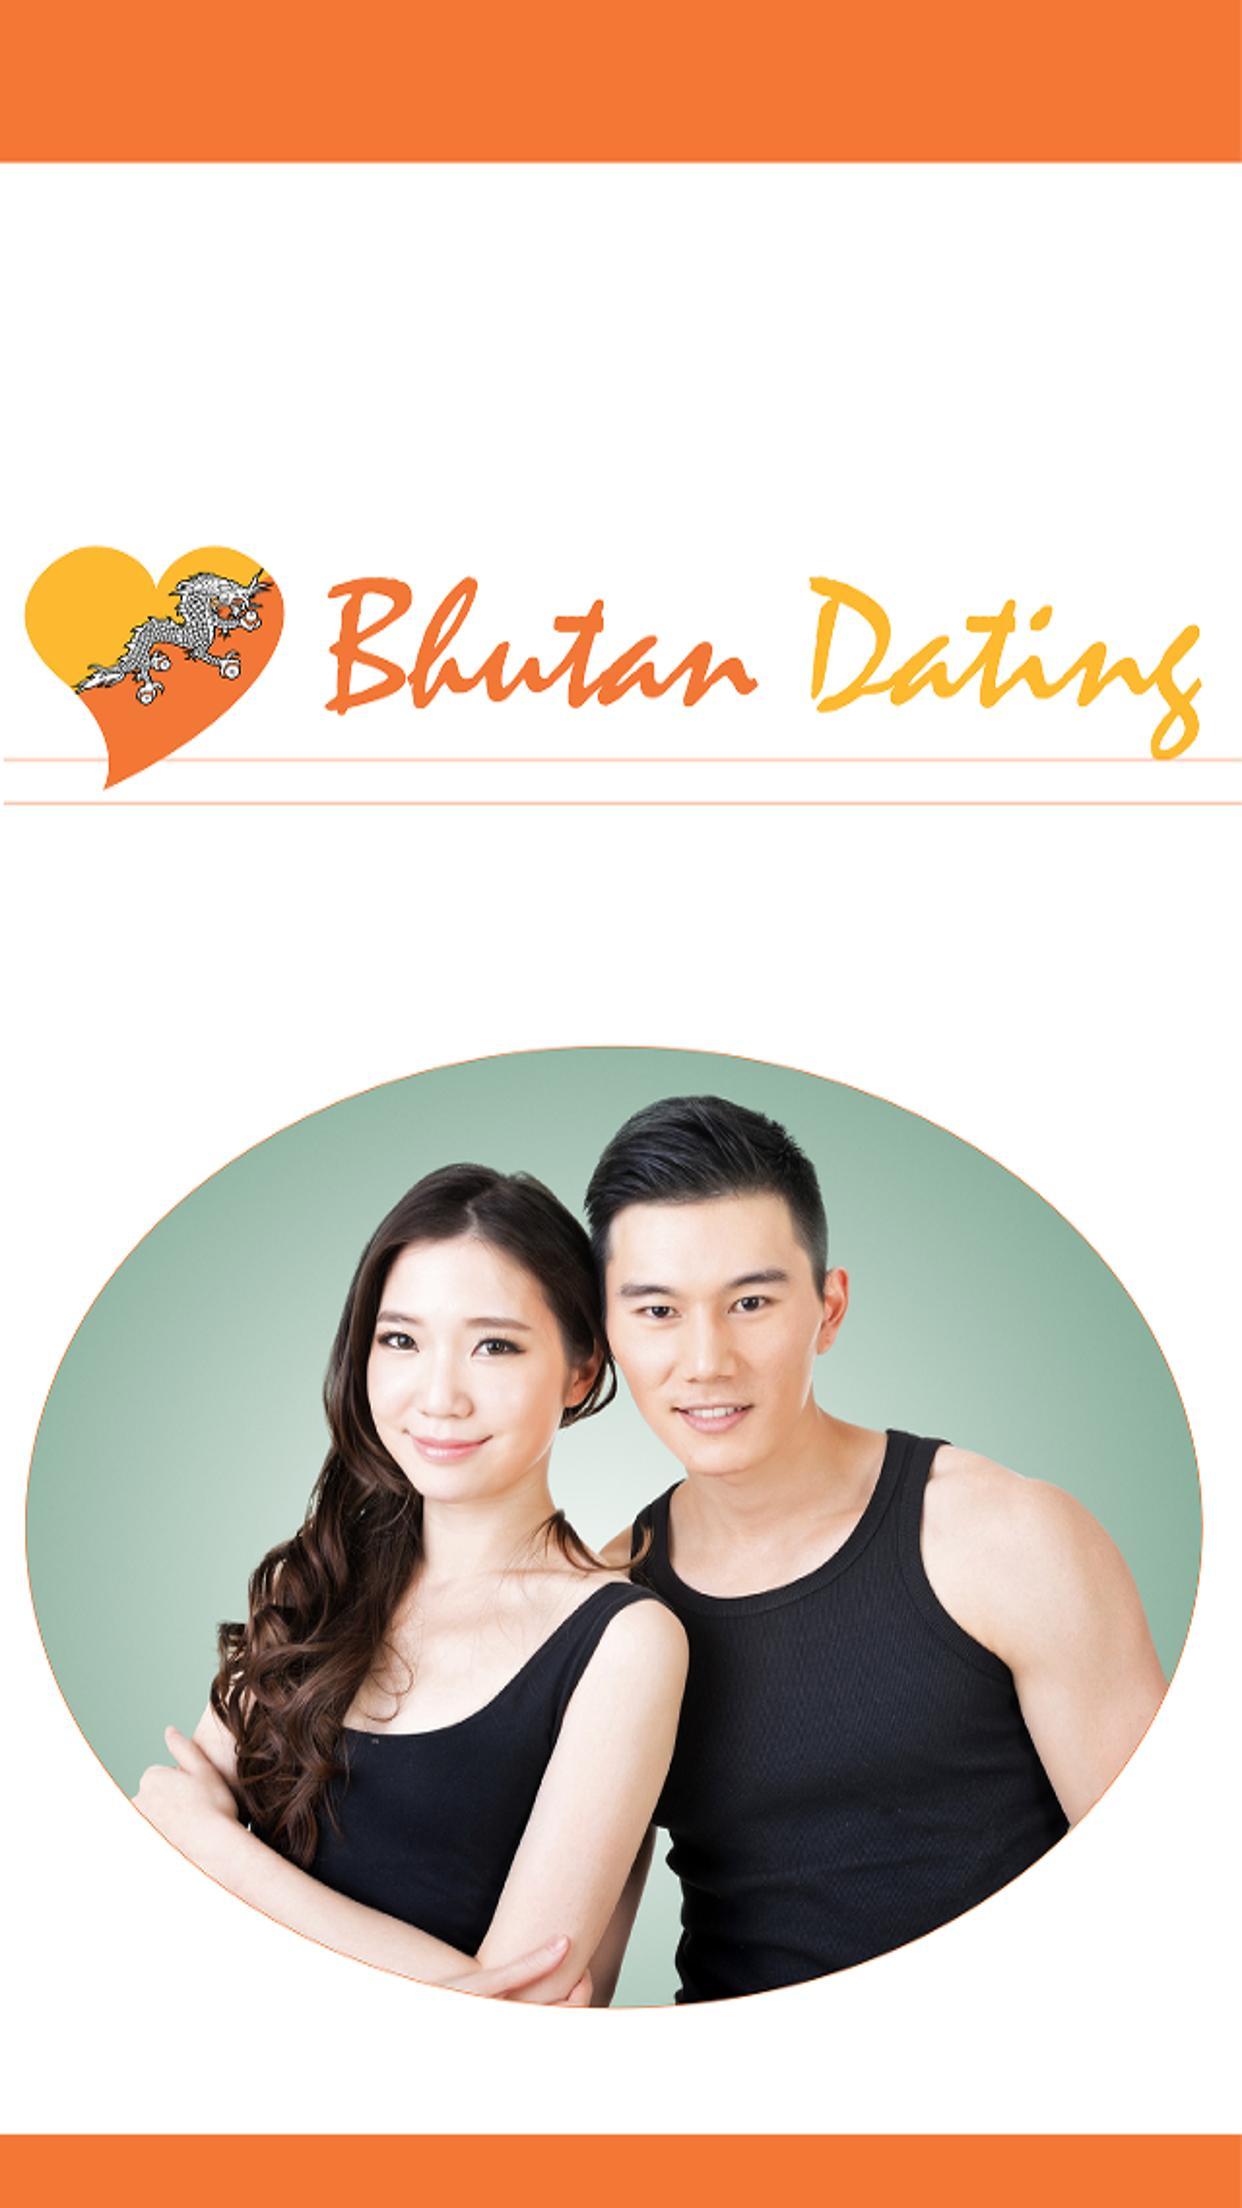 Bhutan dating service